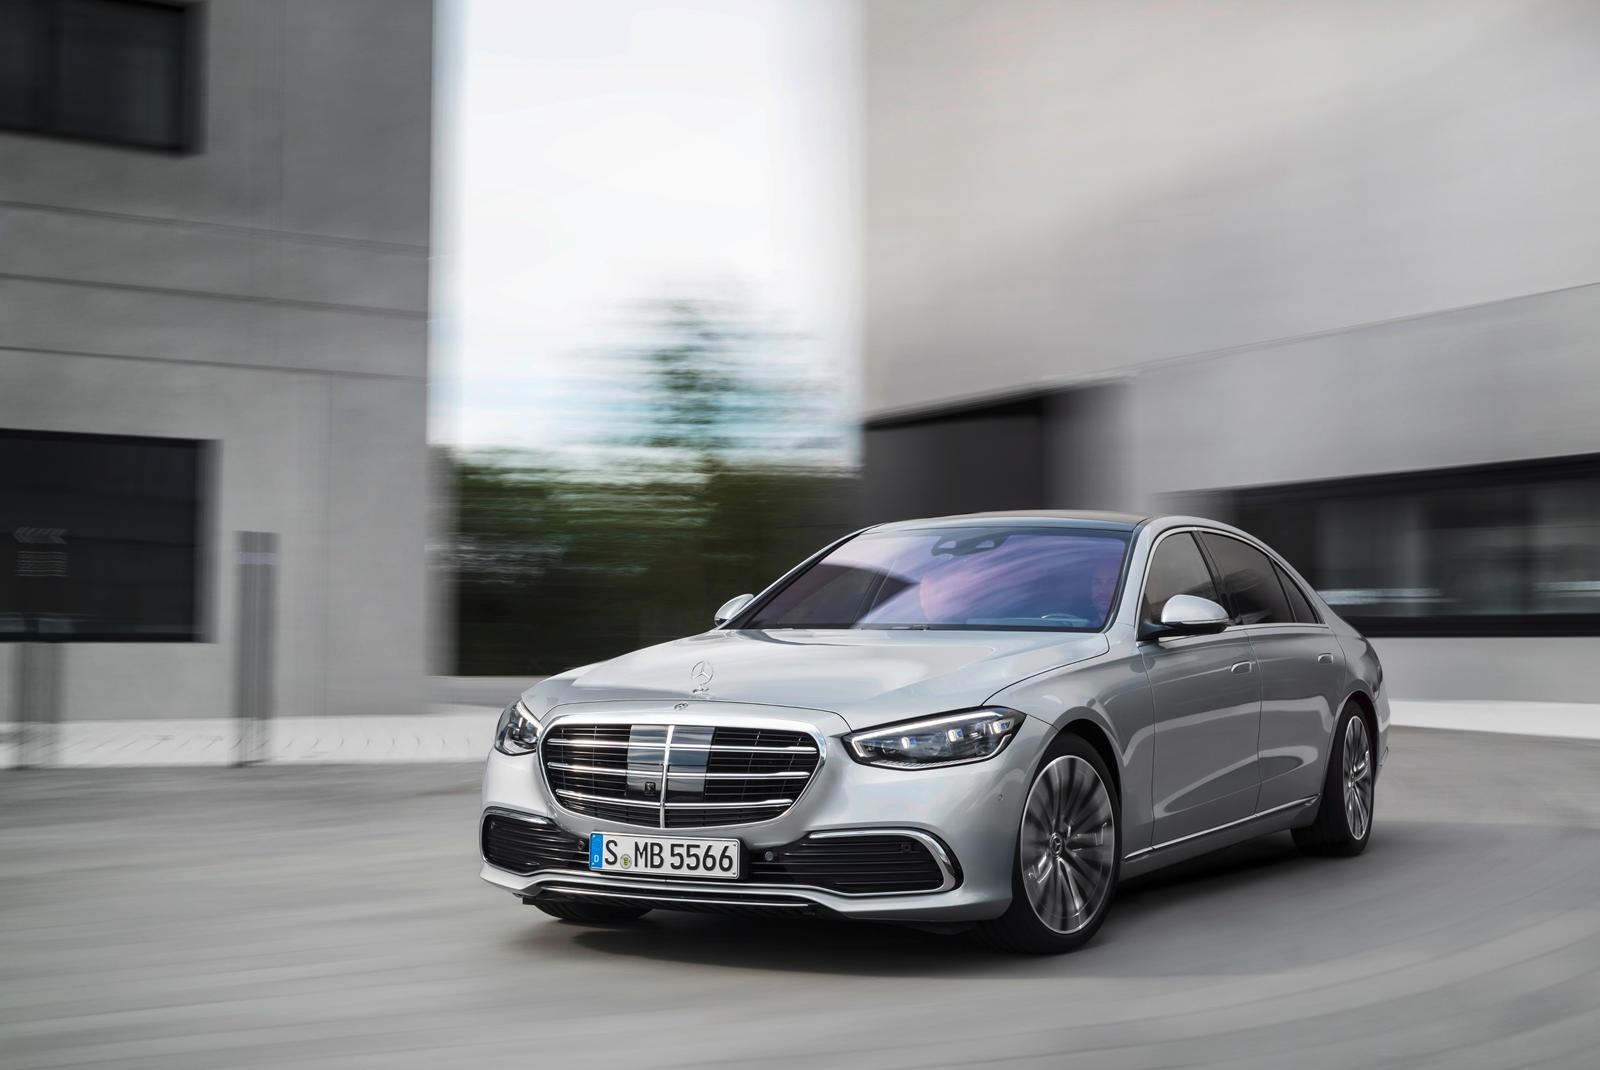 danh gia Mercedes-Benz S-Class 2021 anh 16